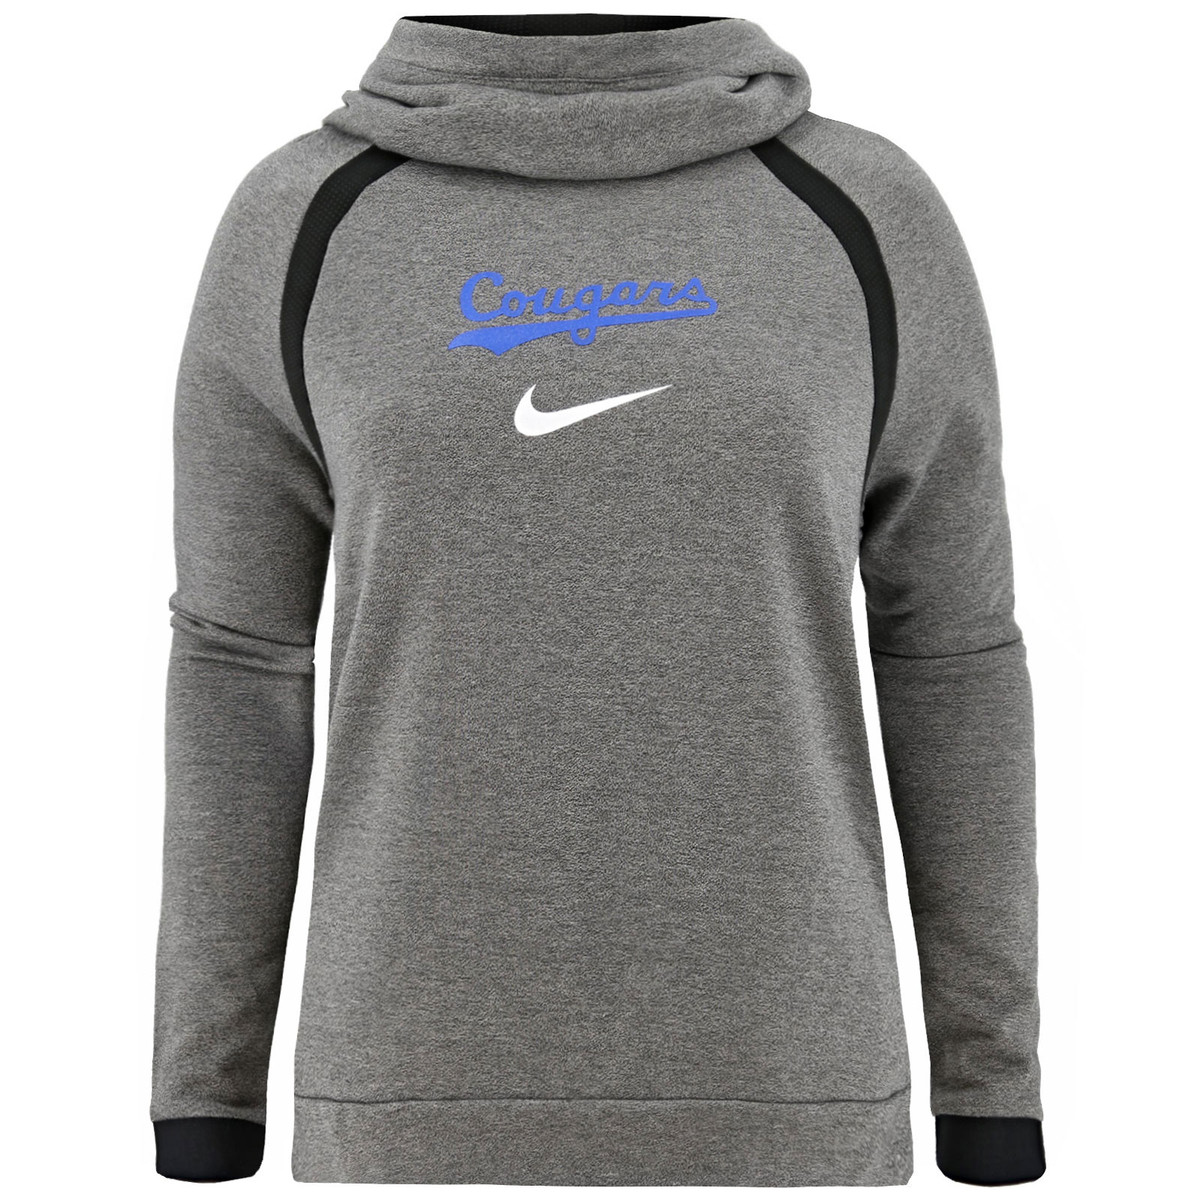 535cc06591dd Women s Dri-Fit Cougars BYU Hoodie - Nike